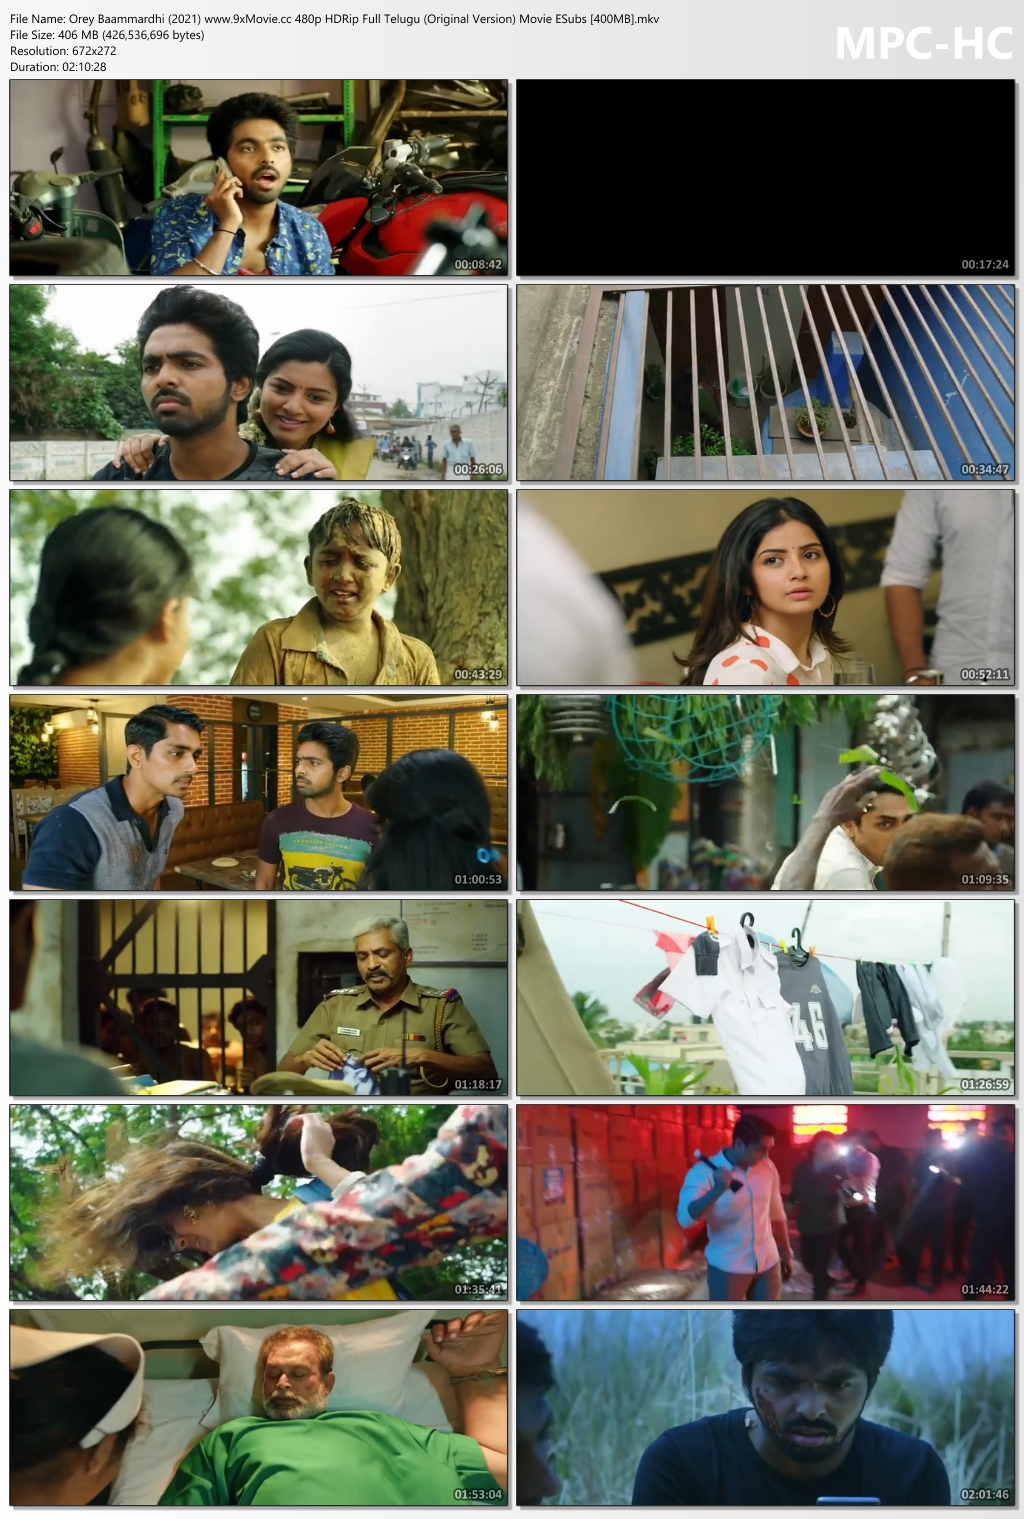 Orey-Baammardhi-2021-www-9x-Movie-cc-480p-HDRip-Full-Telugu-Original-Version-Movie-ESubs-400-MB-mkv